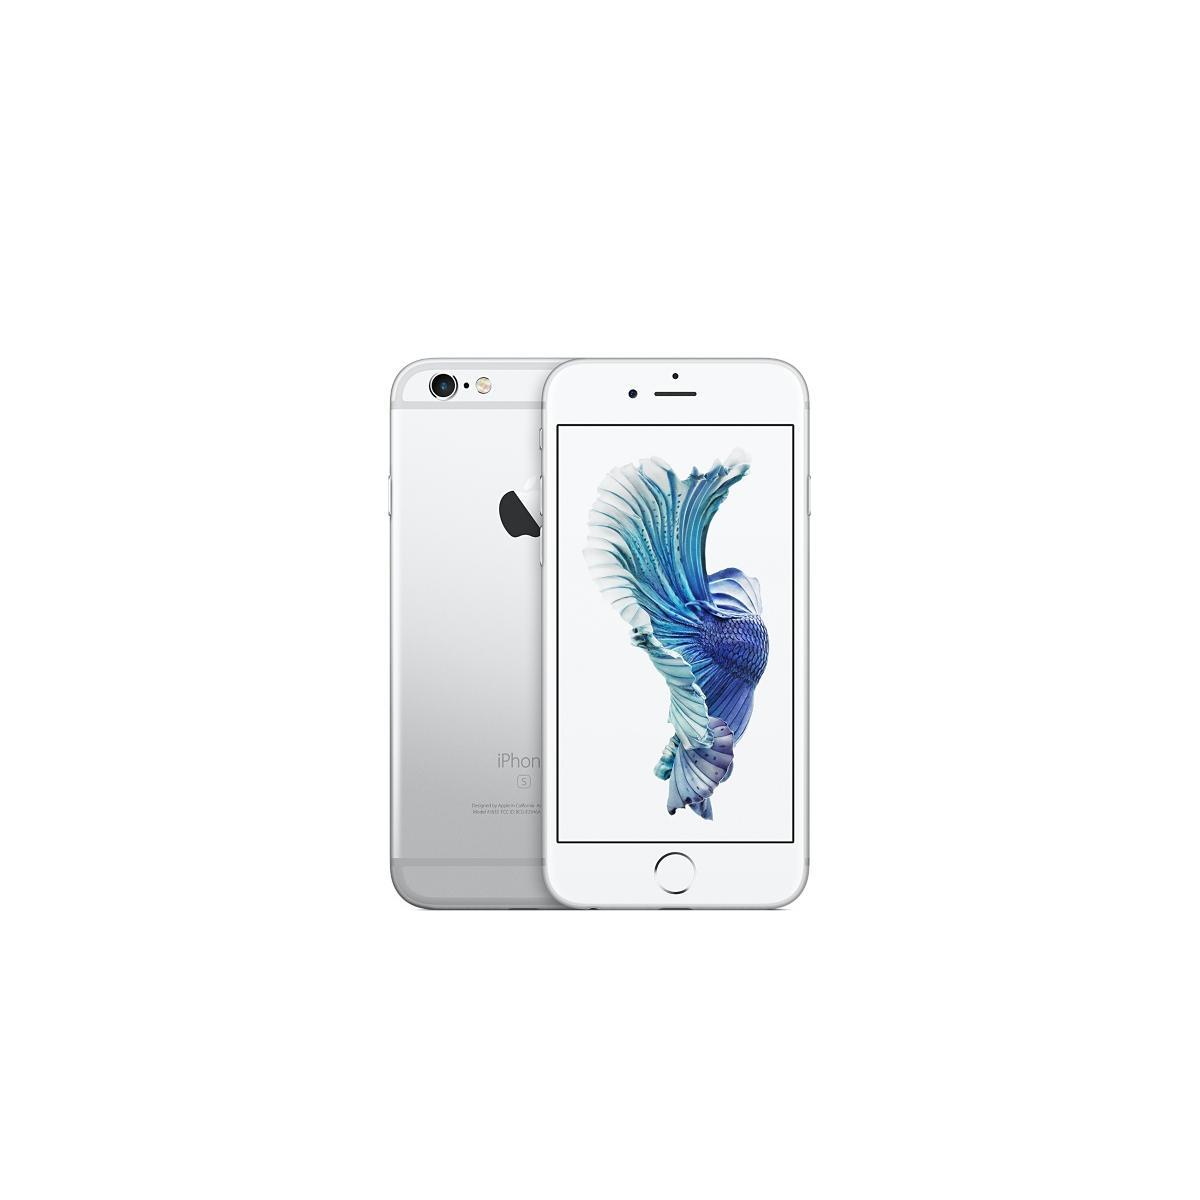 iphone 6 - 800×800